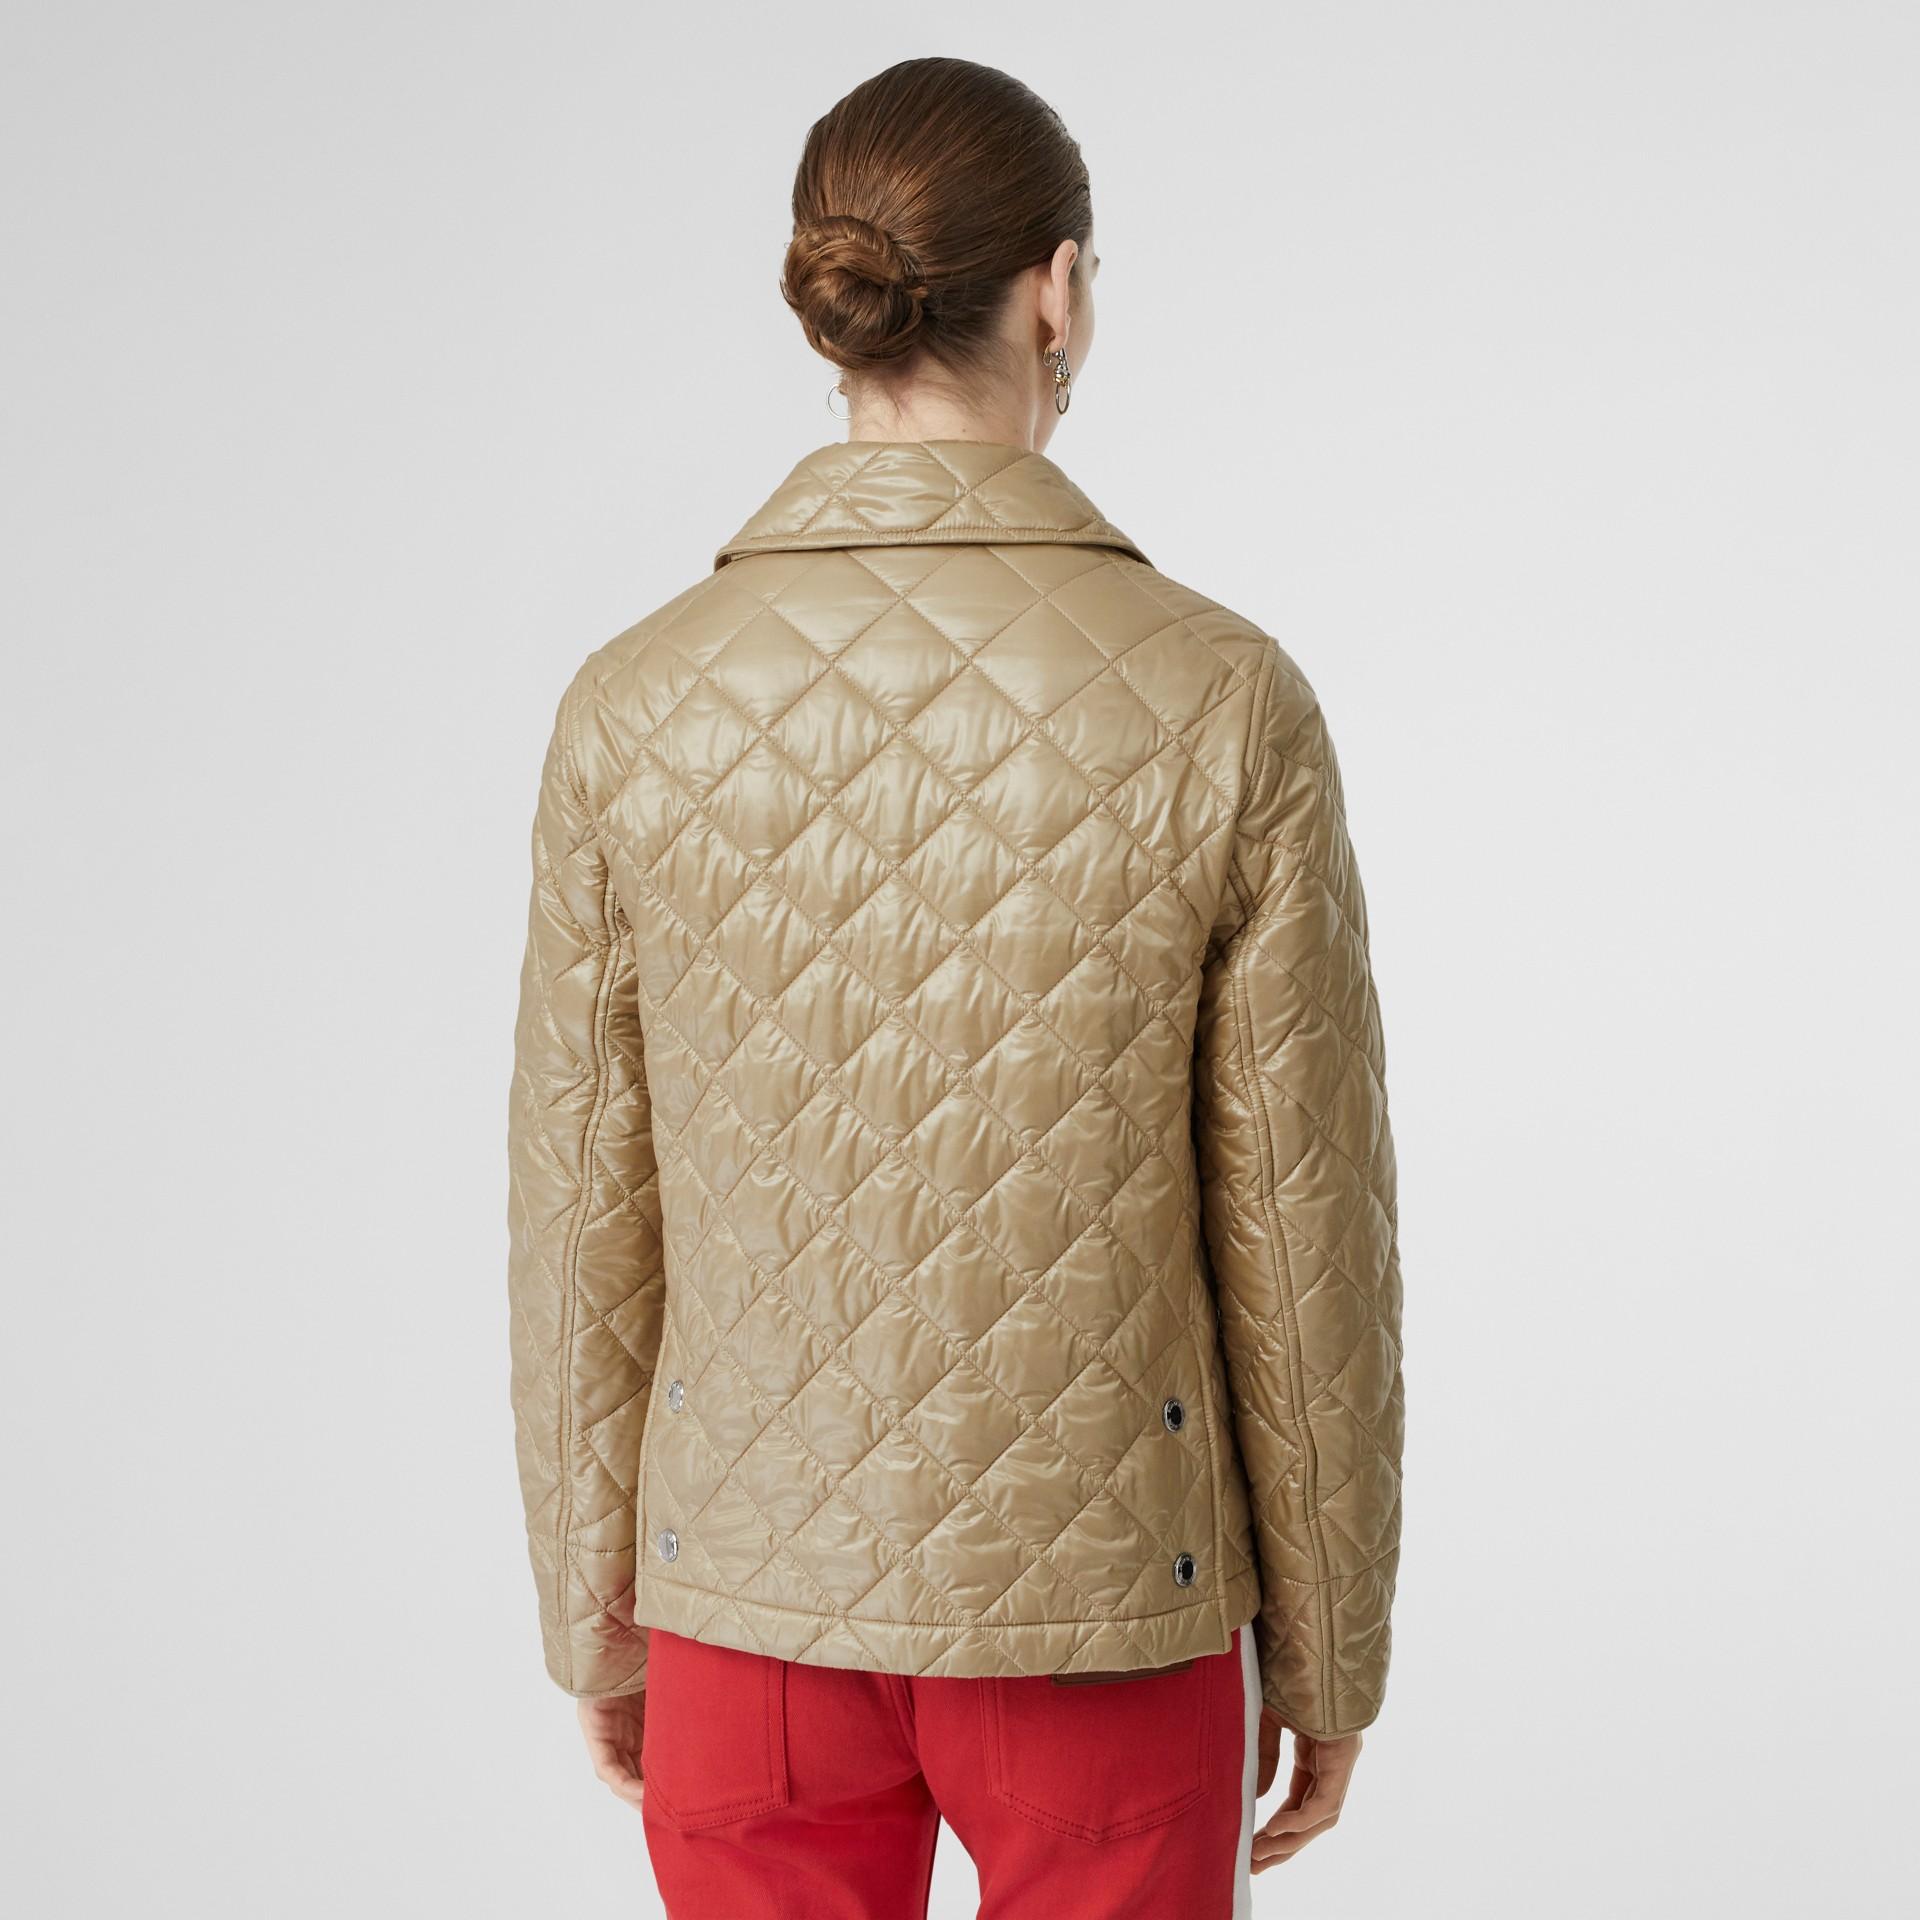 Monogram Motif Diamond Quilted Jacket in Honey - Women | Burberry Hong Kong - gallery image 2